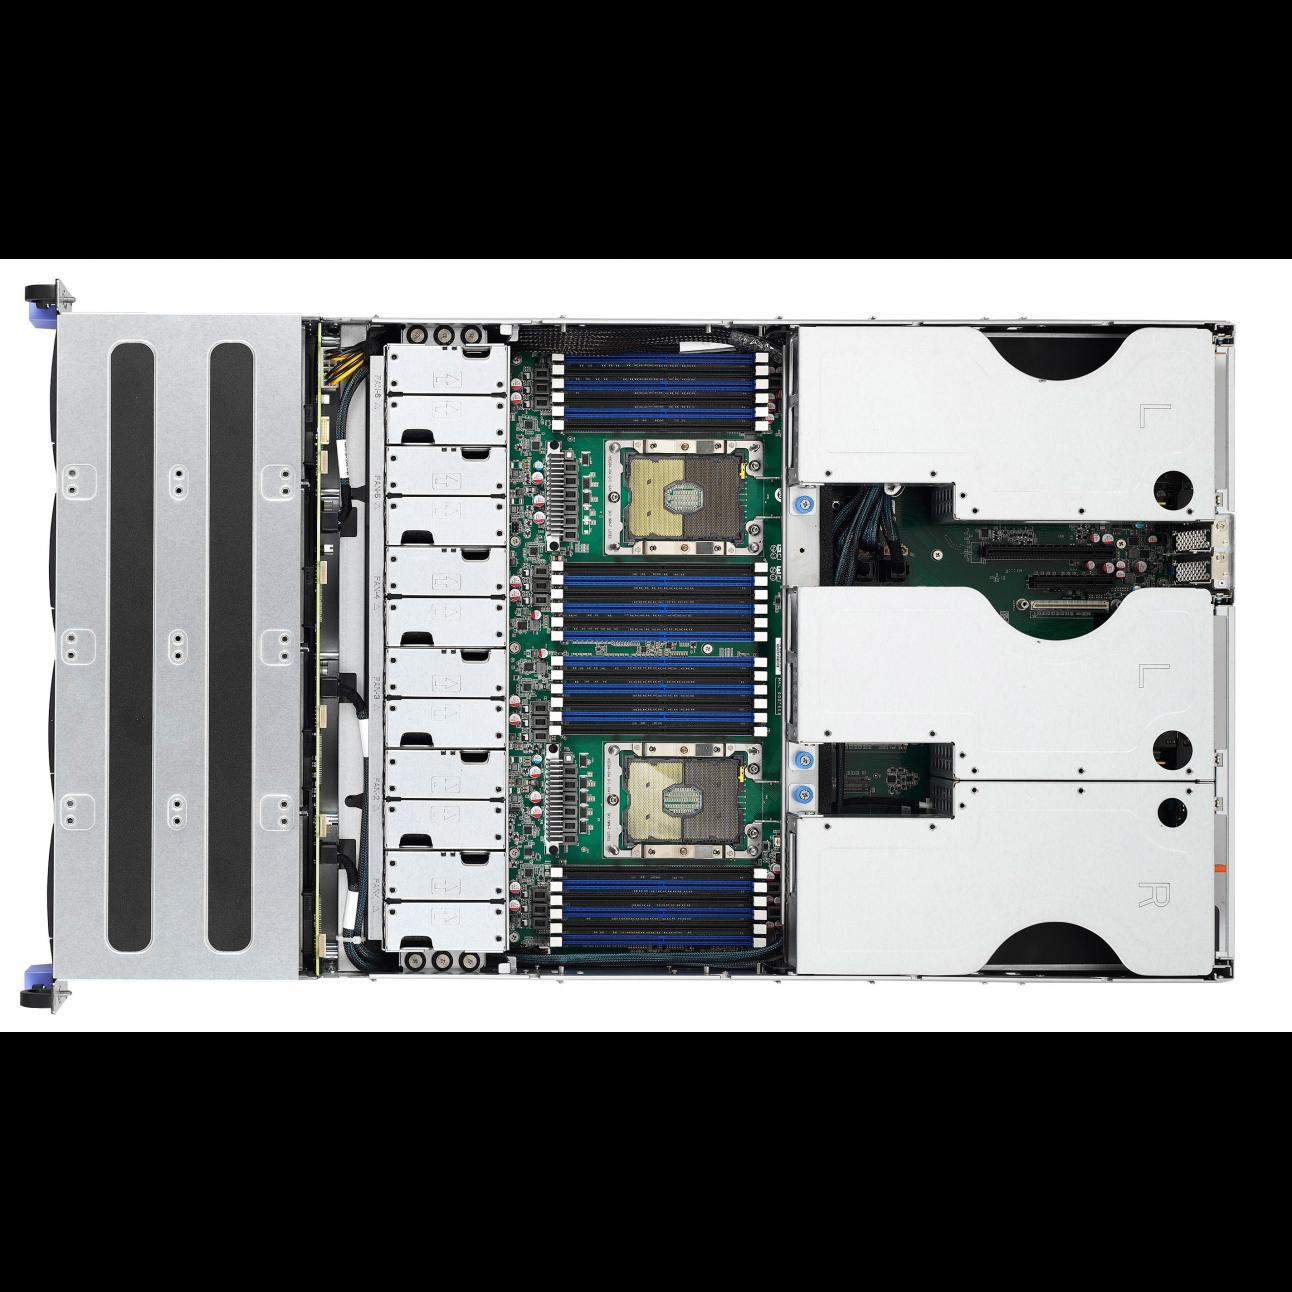 Серверная платформа Tyan Thunder SX B7102T76V12HR, 2U, Scalable, DDR4, 12xHDD, резервируемый БП